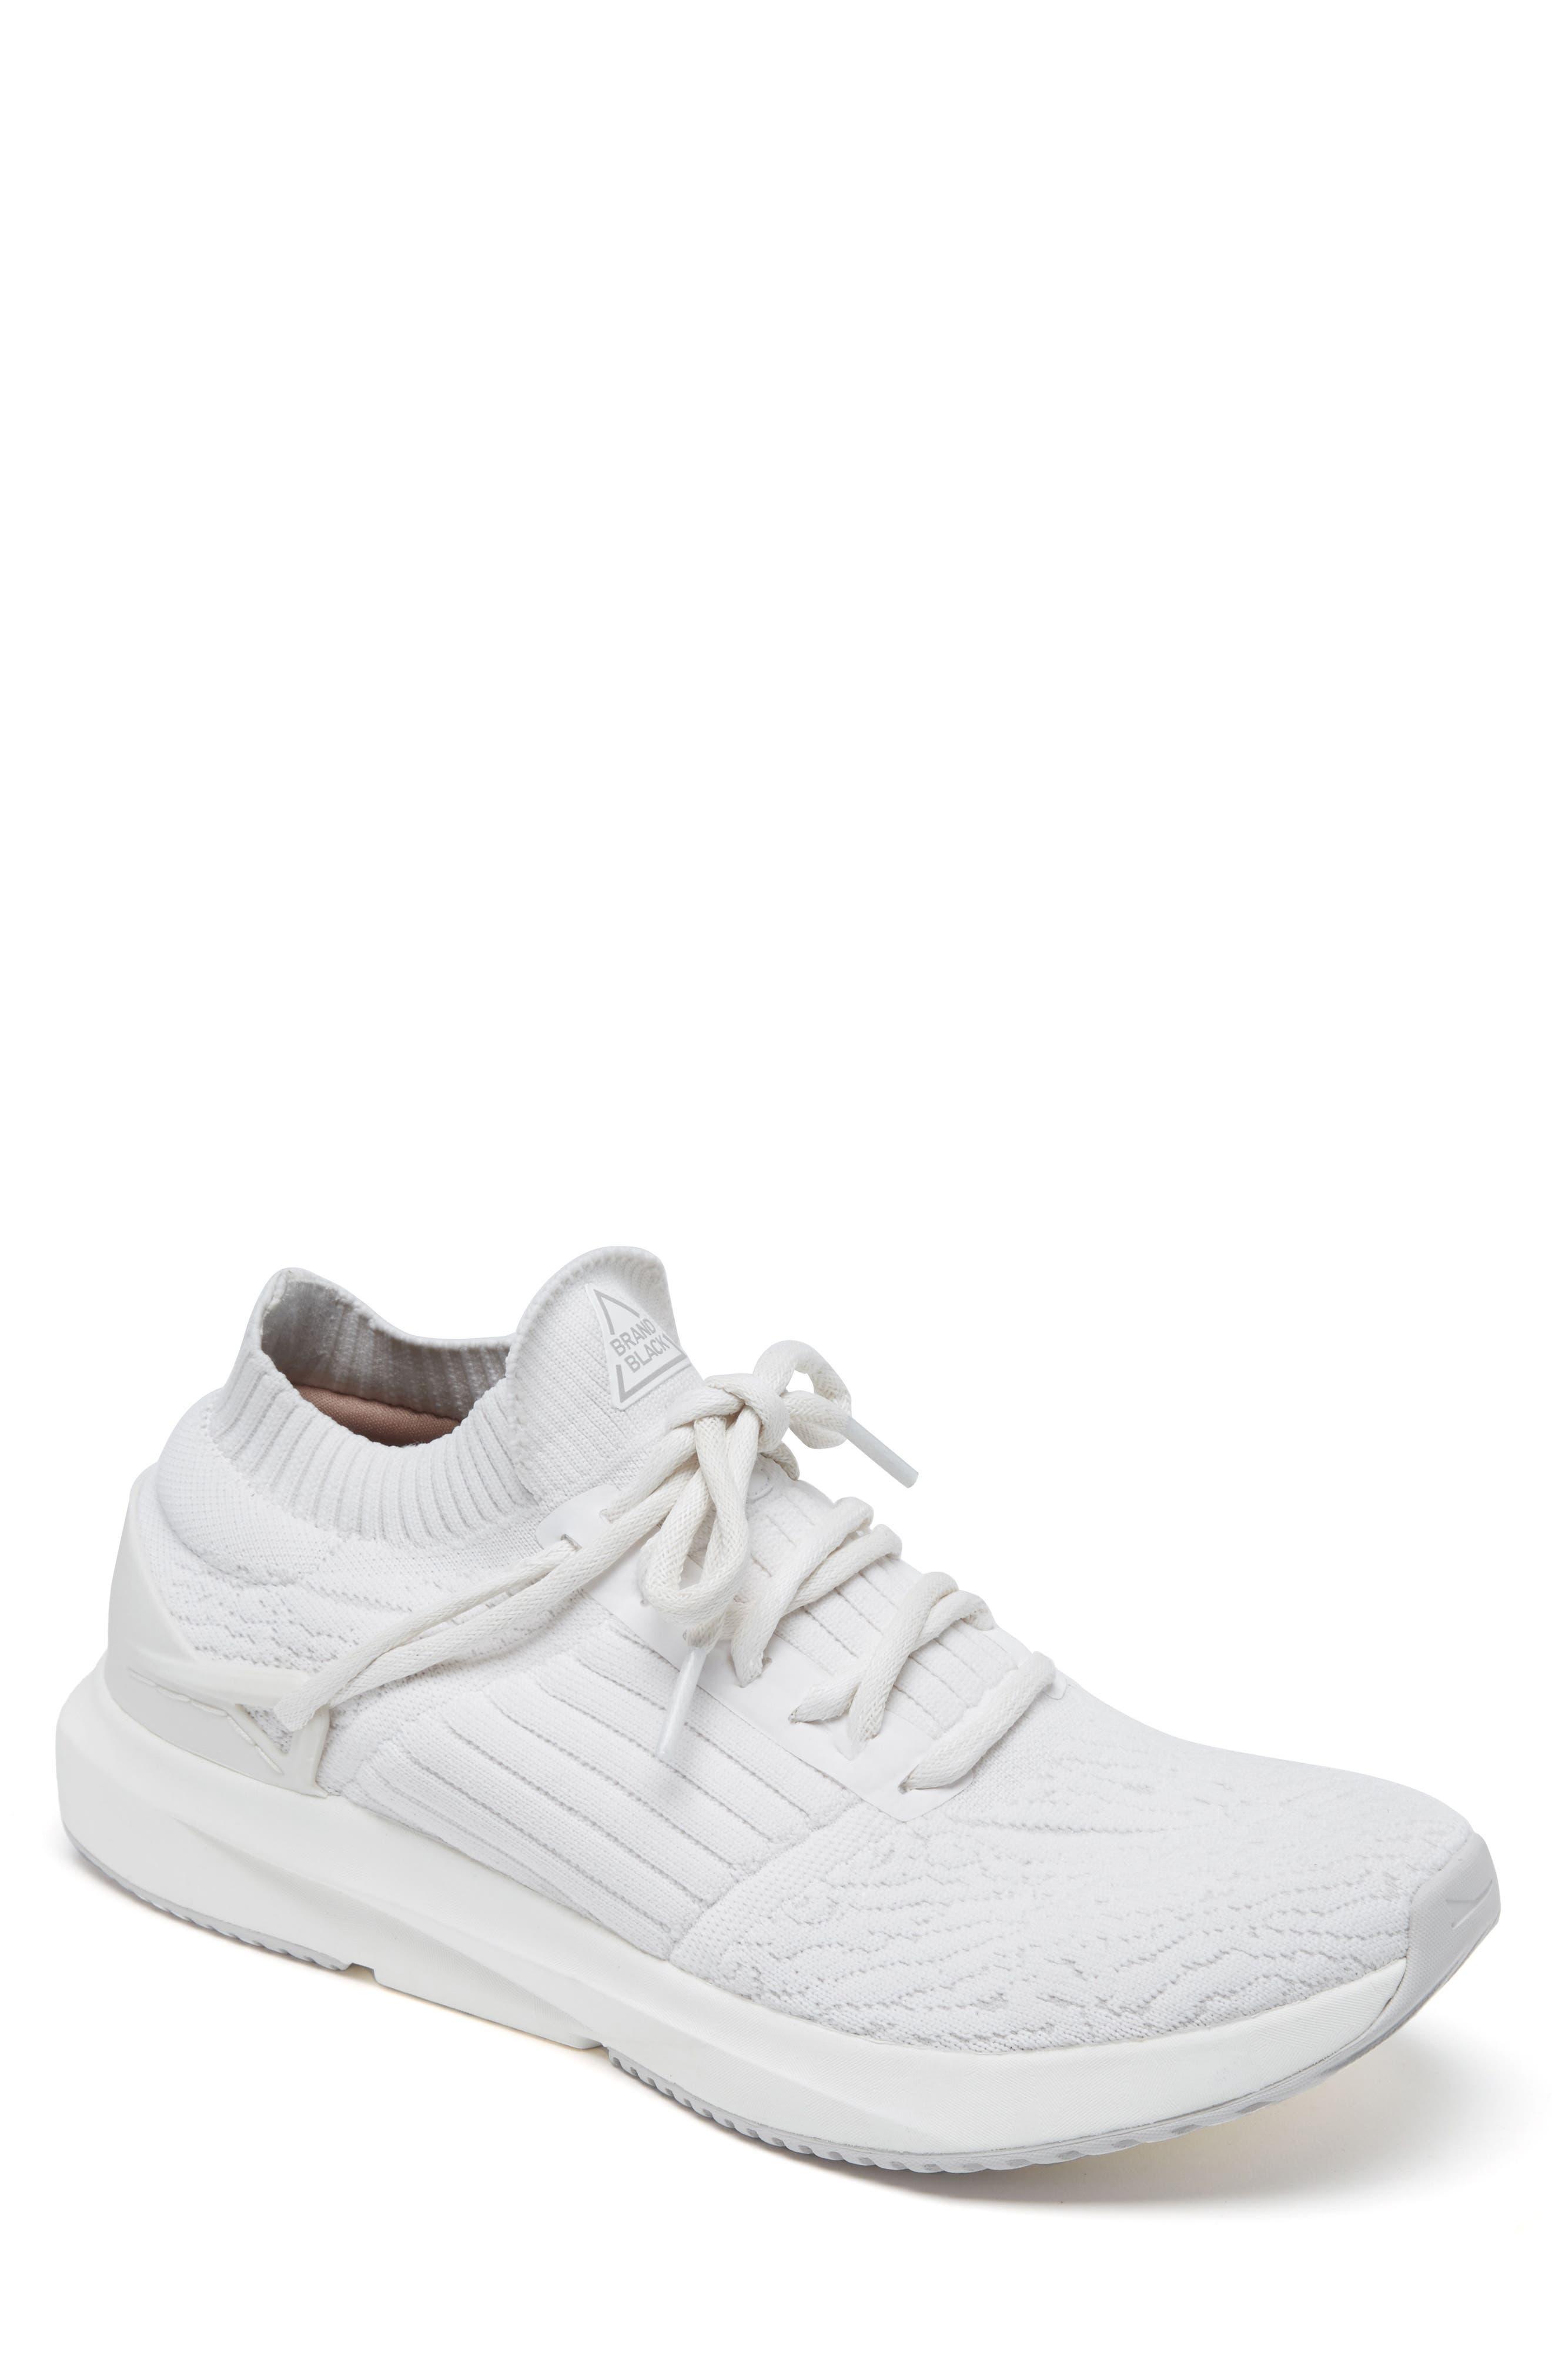 Alternate Image 1 Selected - BRANDBLACK Viento Sneaker (Men)